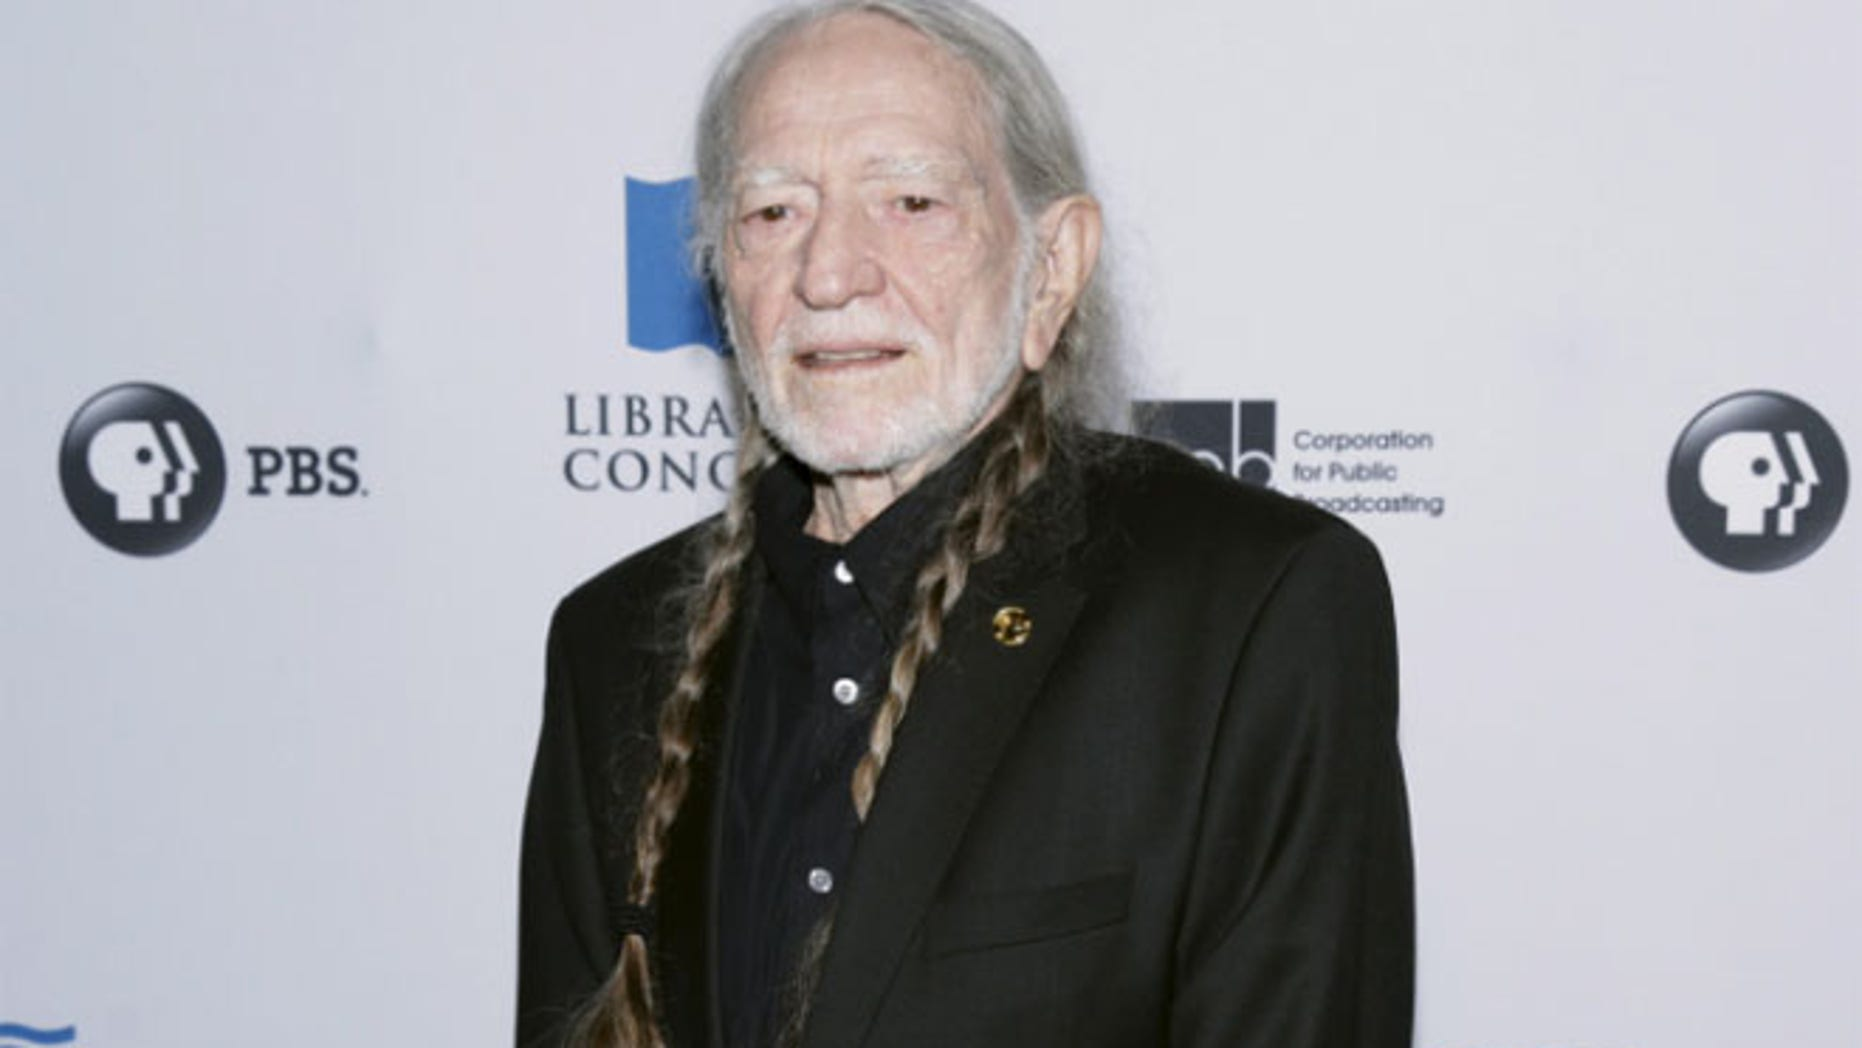 Willie Nelson has postponed three California shows because of illness.